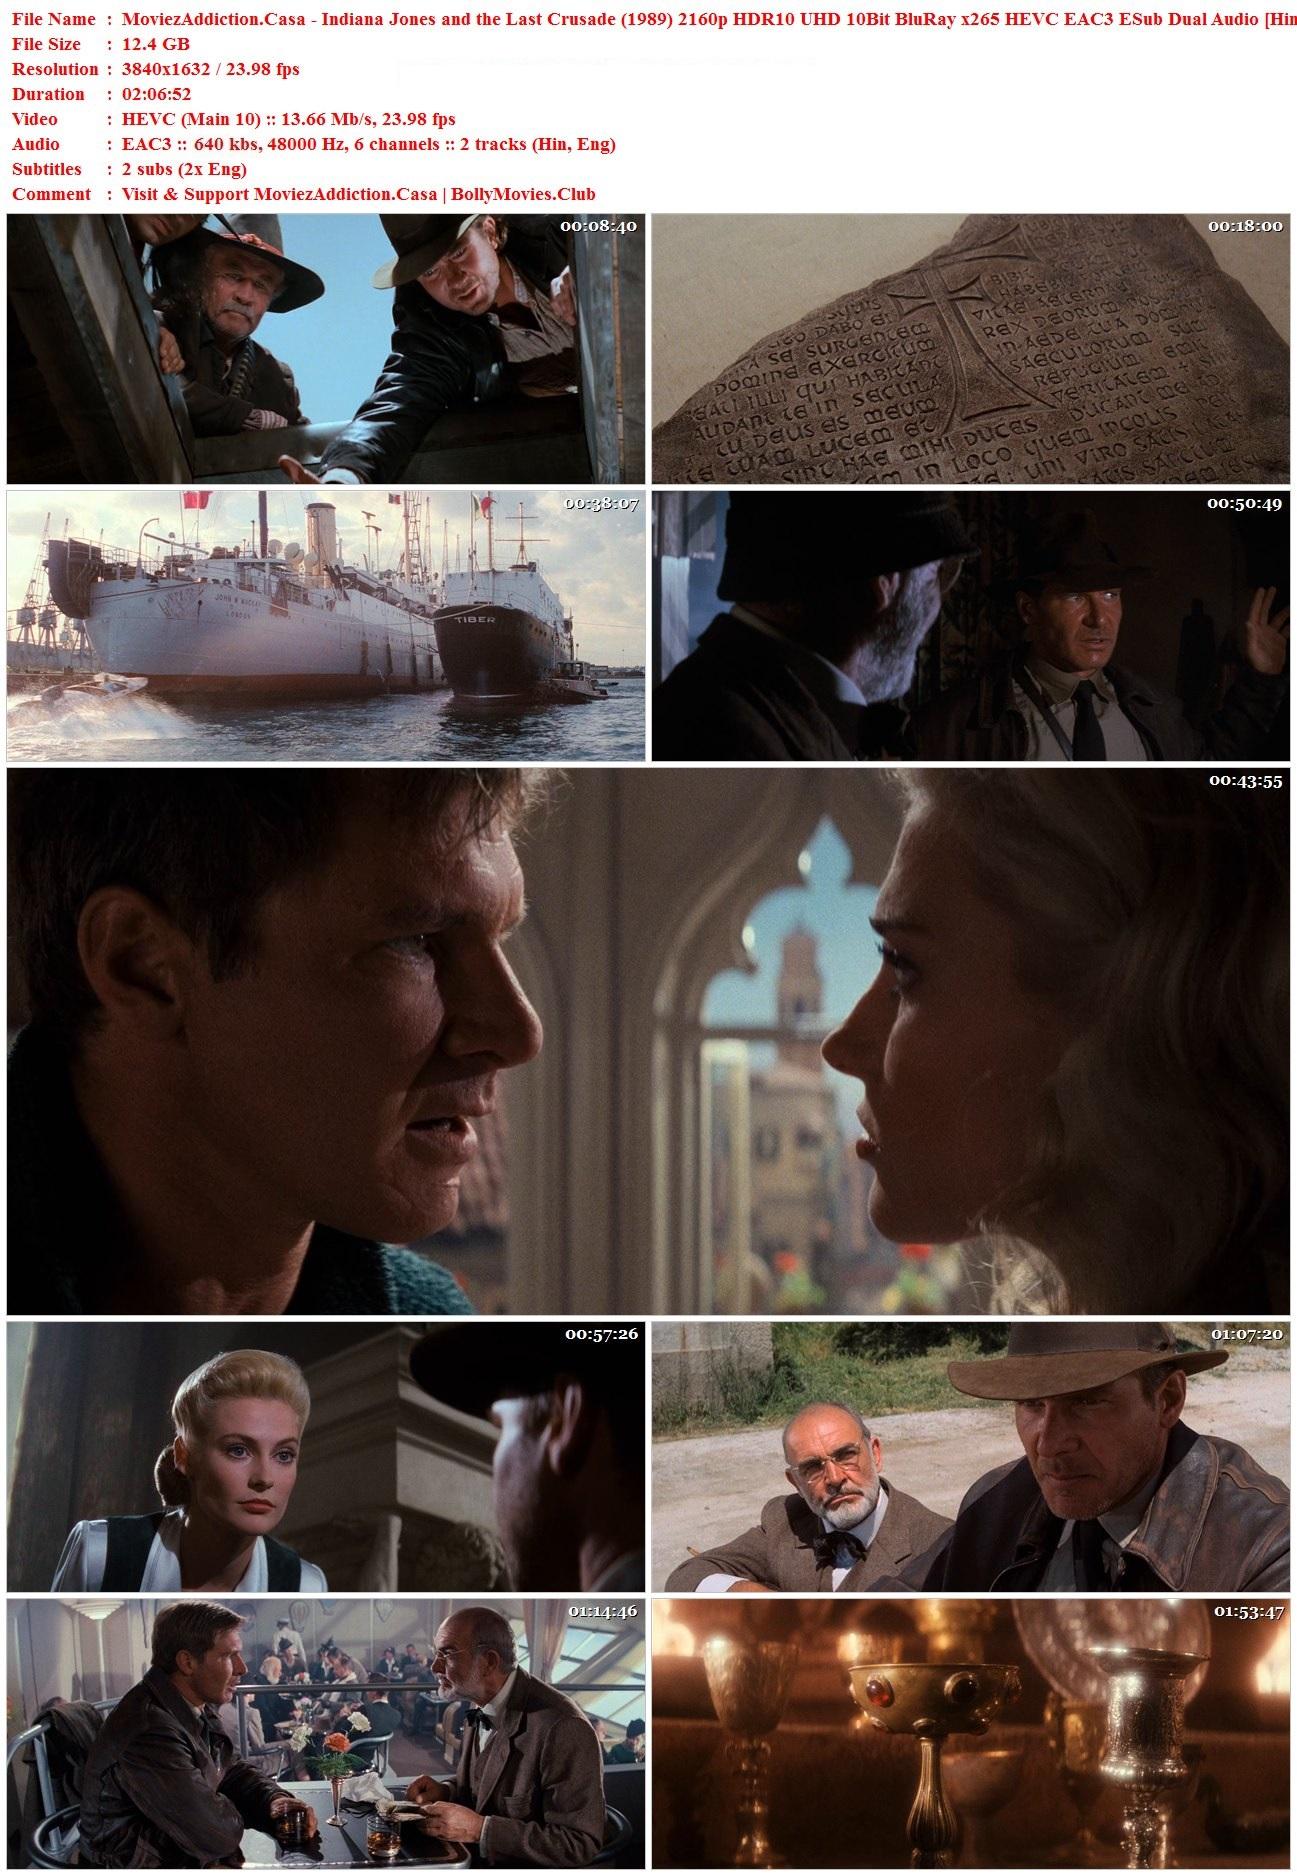 Download Indiana Jones and the Last Crusade